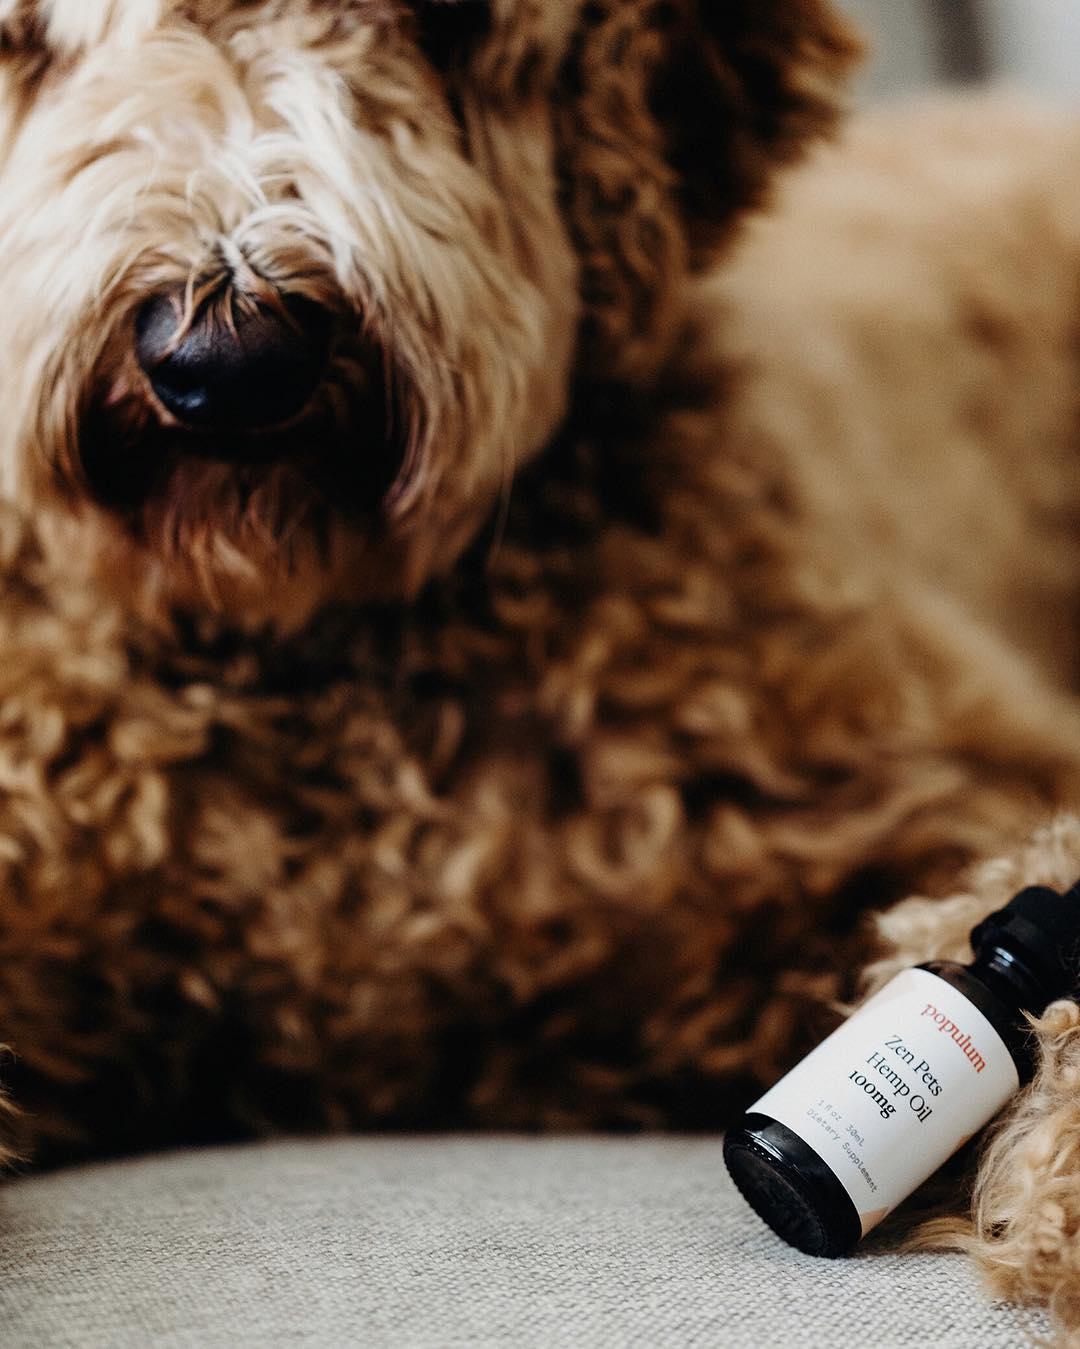 CBD Oil for Pets | CBD oil for Dogs | Populum Zen Pets CBD Oil